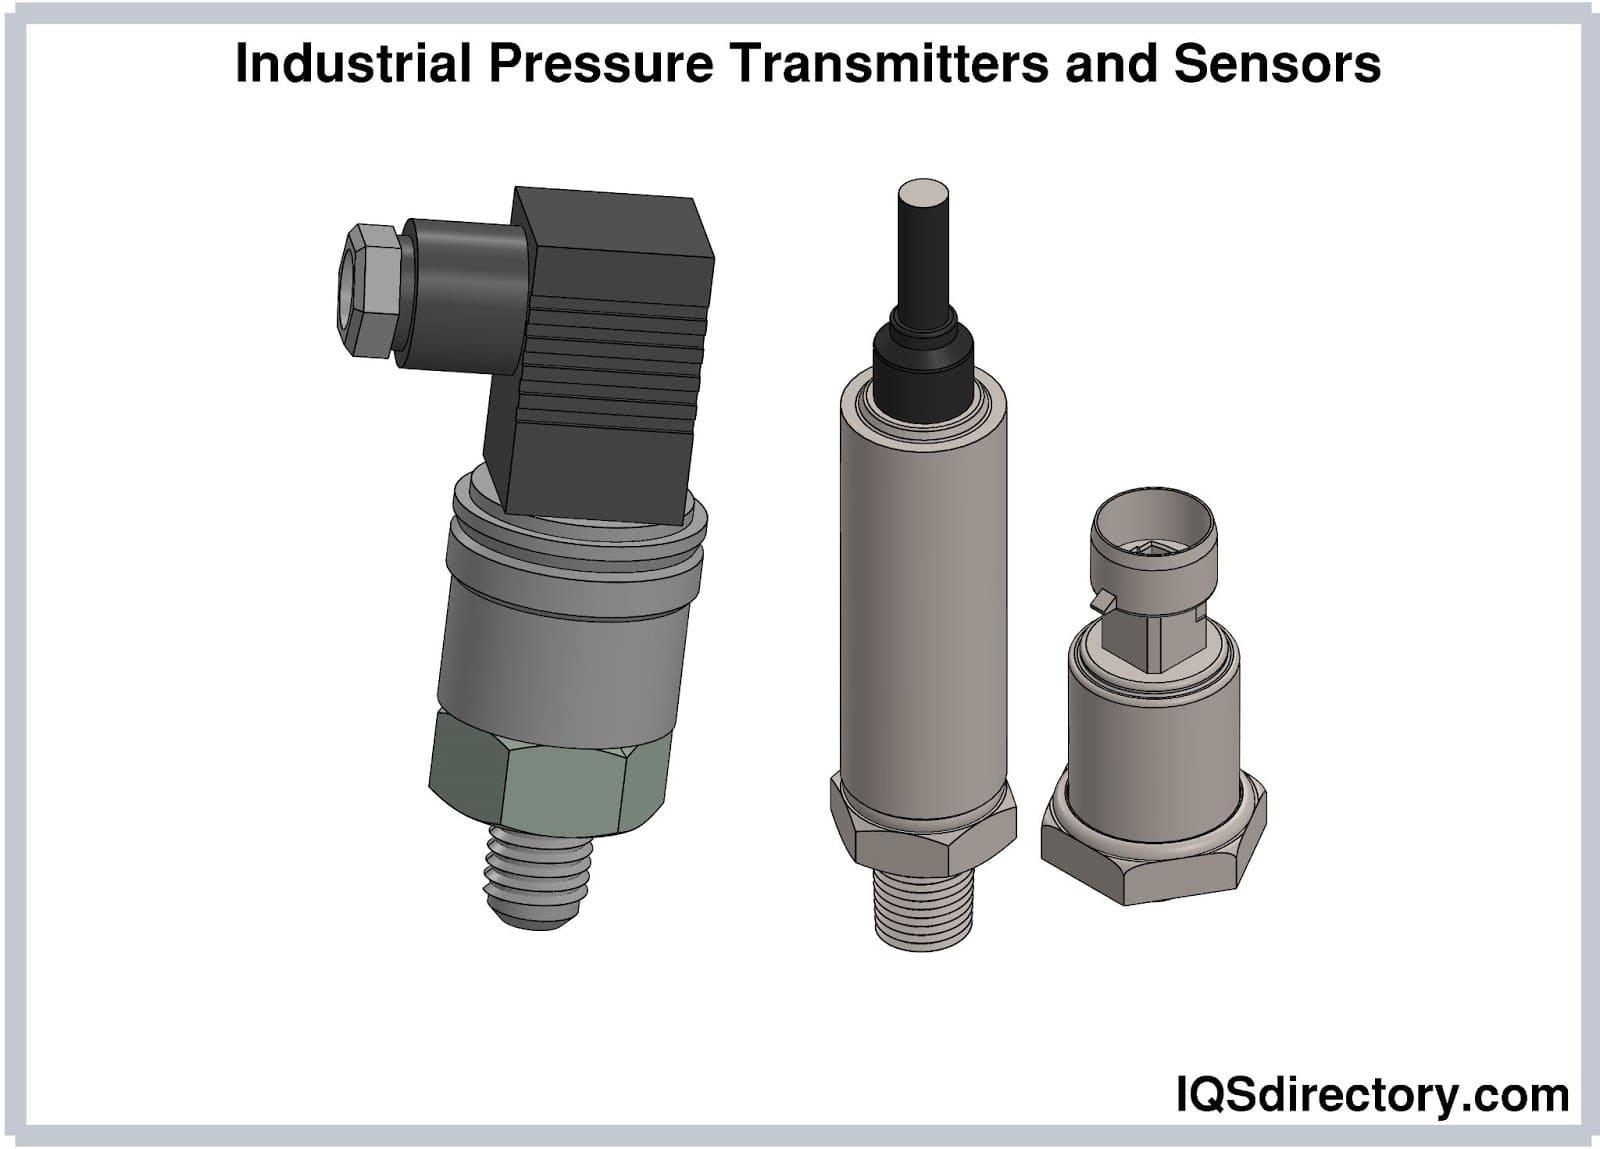 Industrial Pressure Transmitters and Sensors